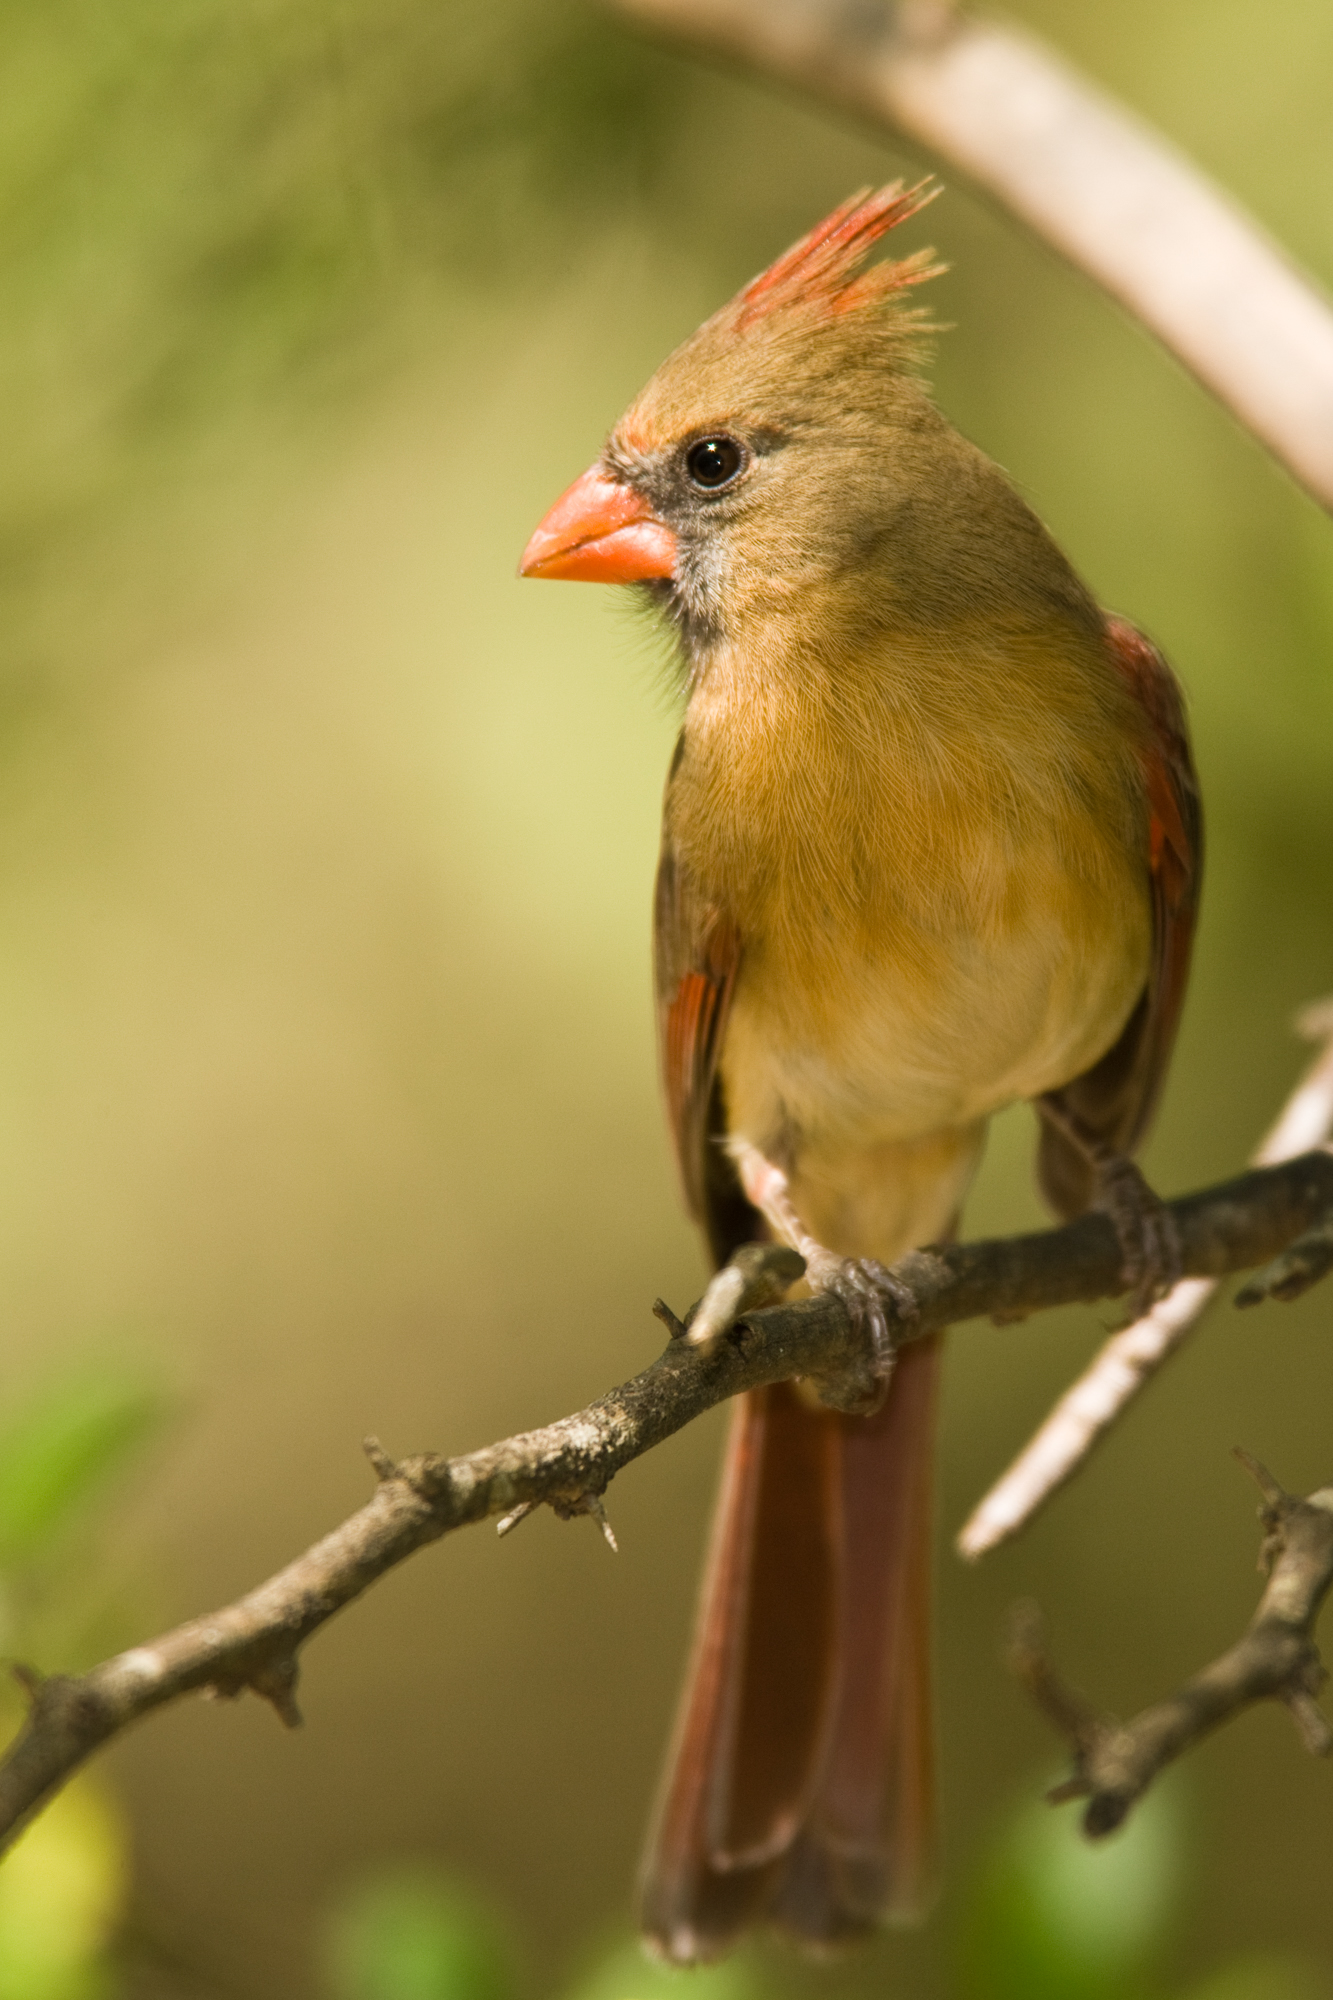 Northern Cardinal, female..雌性主红雀